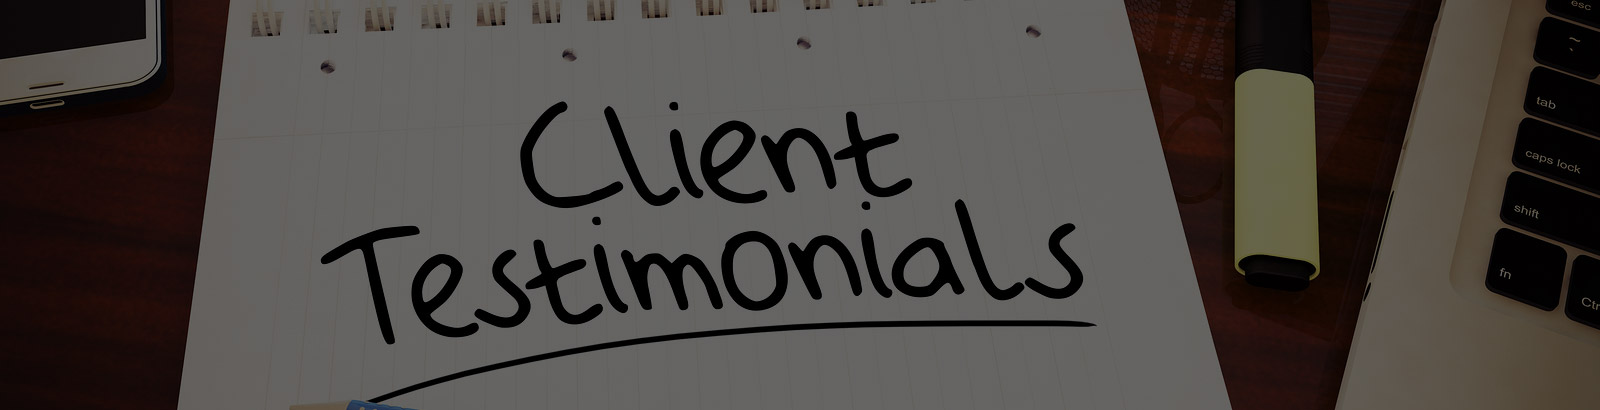 testimonials-01